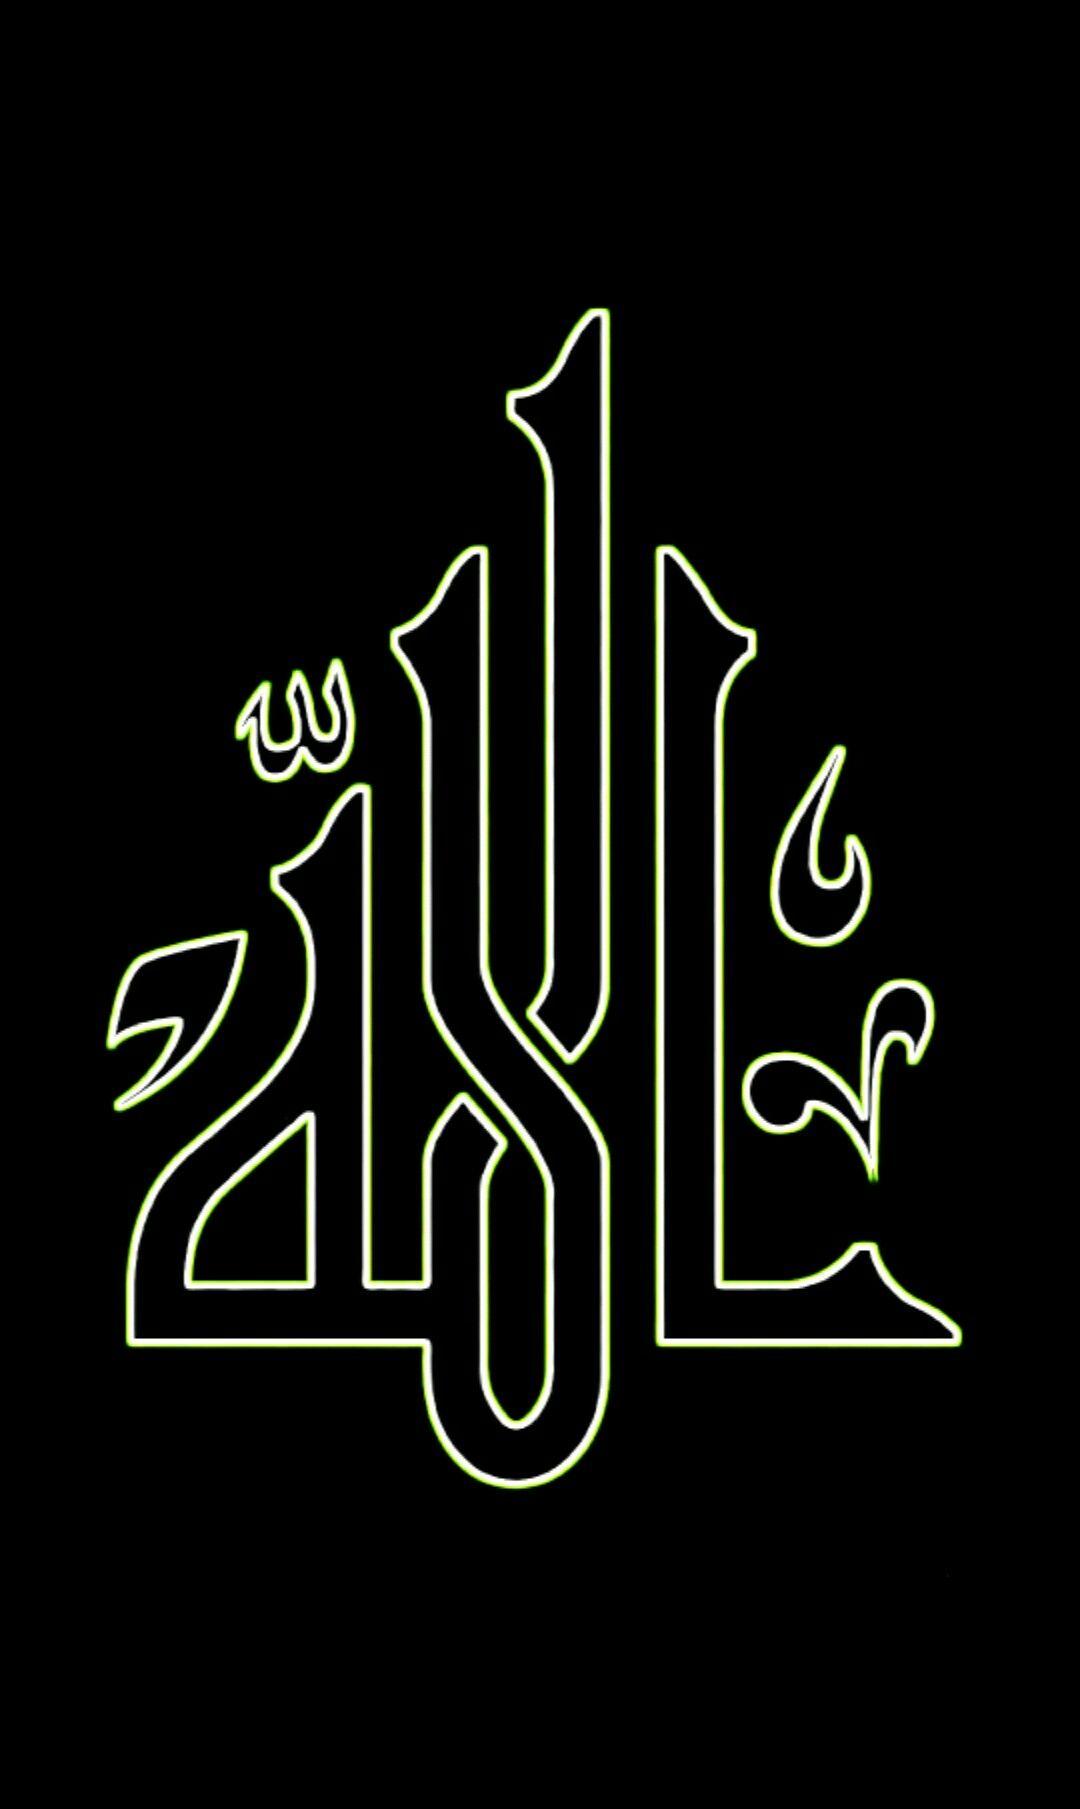 Pin By Maarif E Islam On Islamic Art Islamic Calligraphy Calligraphy Art Islamic Art Calligraphy